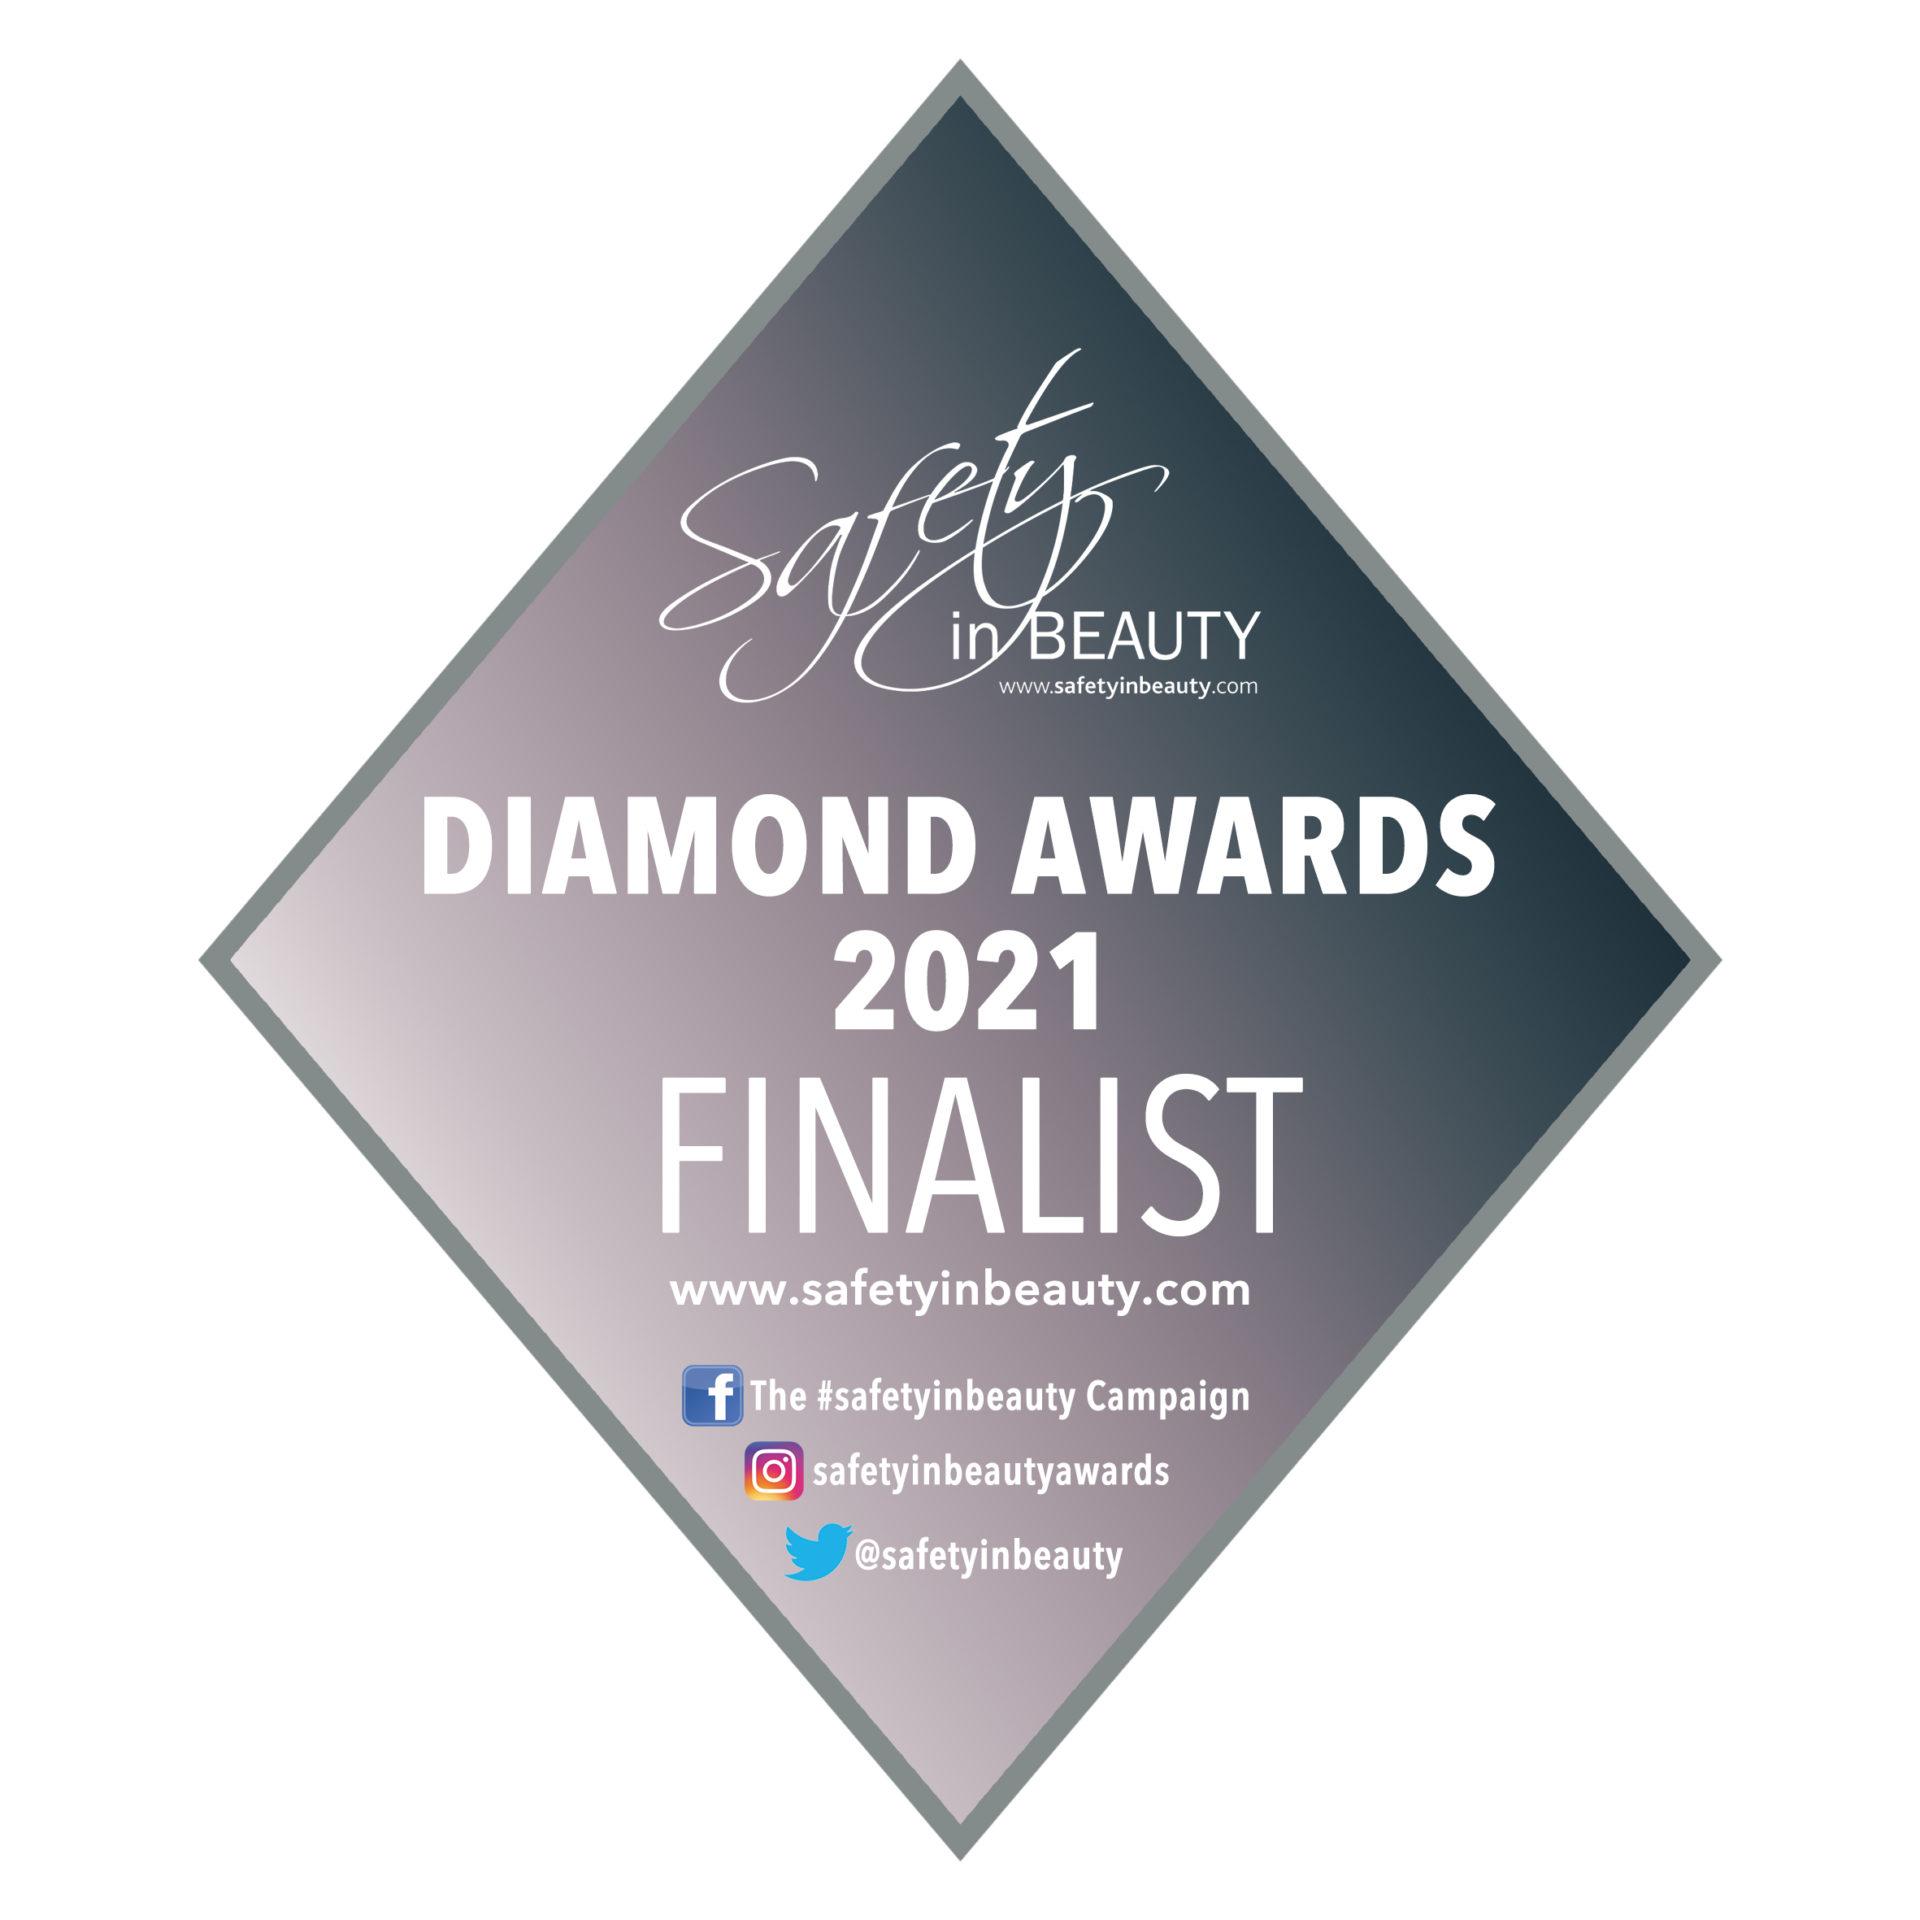 Safety in Beauty Diamond Award Finalists 2021